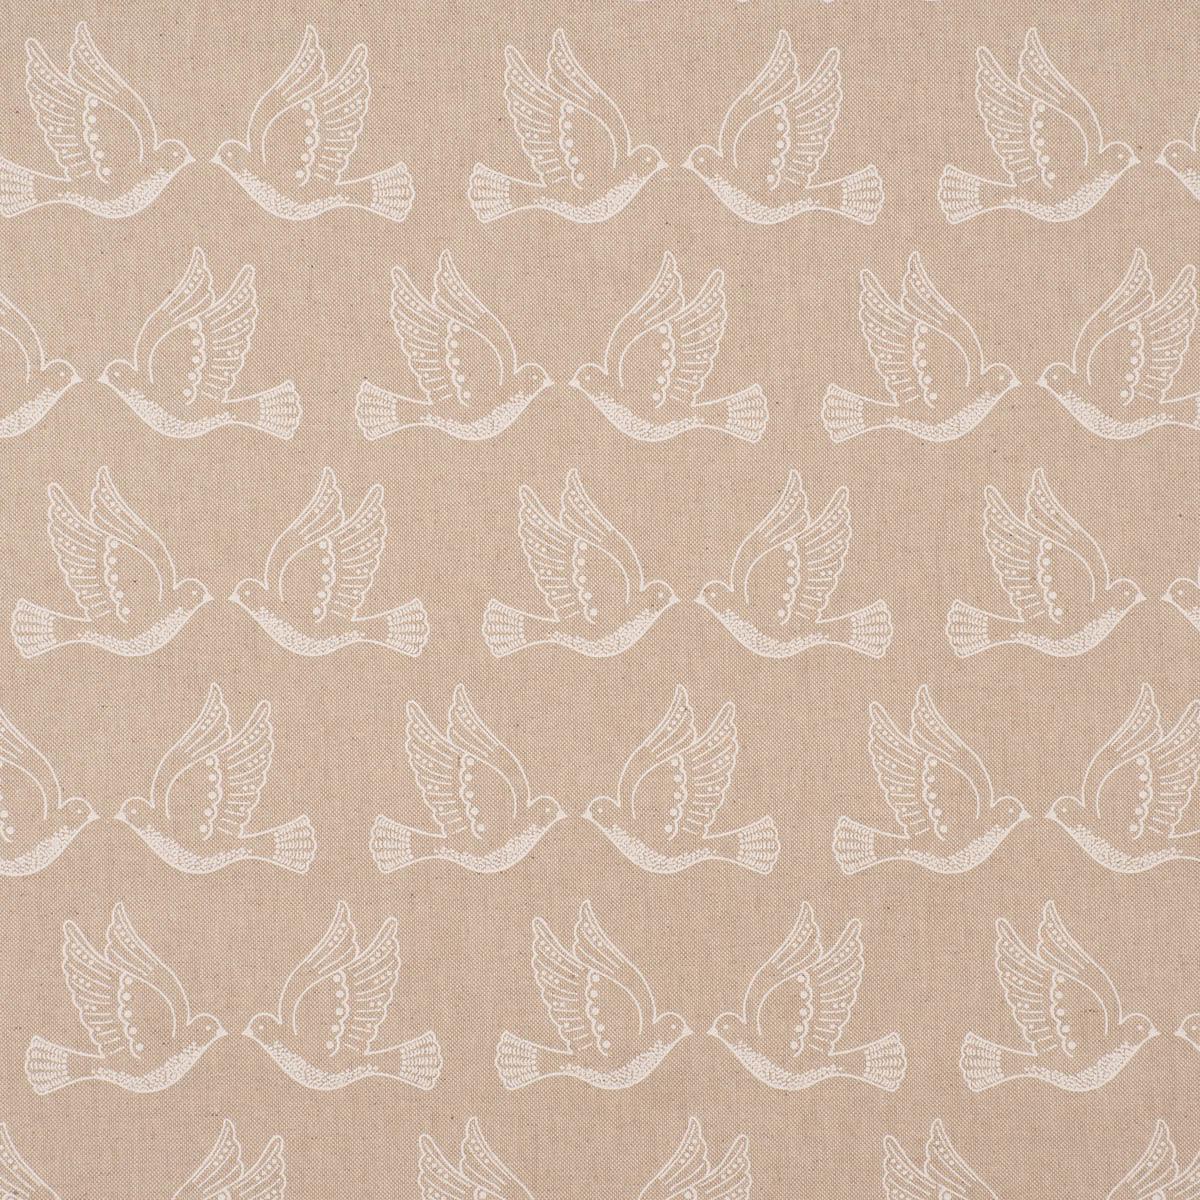 Dekostoff Halbpanama Leinenlook Peace Dove Iconic Taubenpaar natur weiß 1,40m Breite